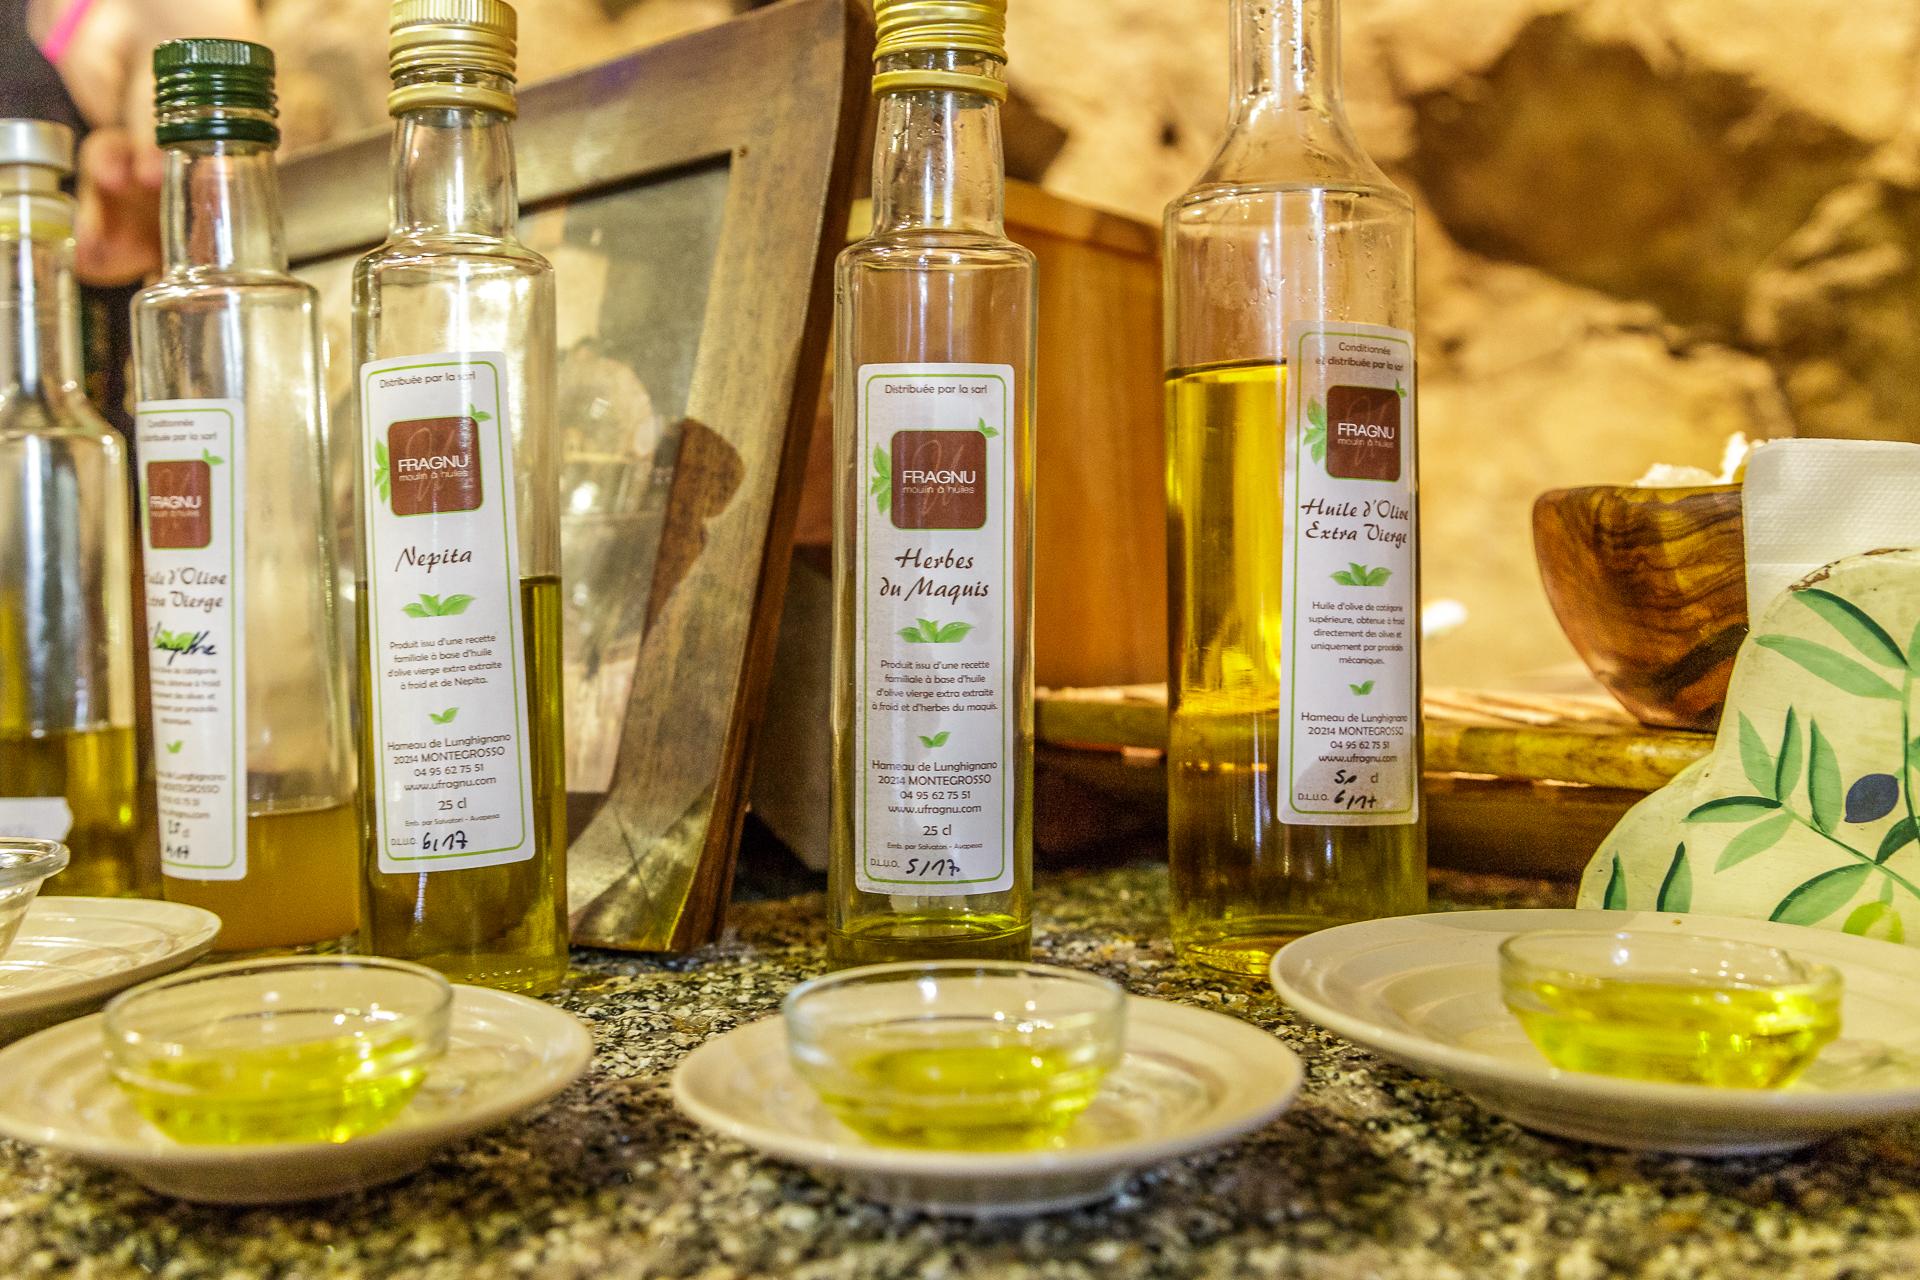 Korsika-Olivenoel